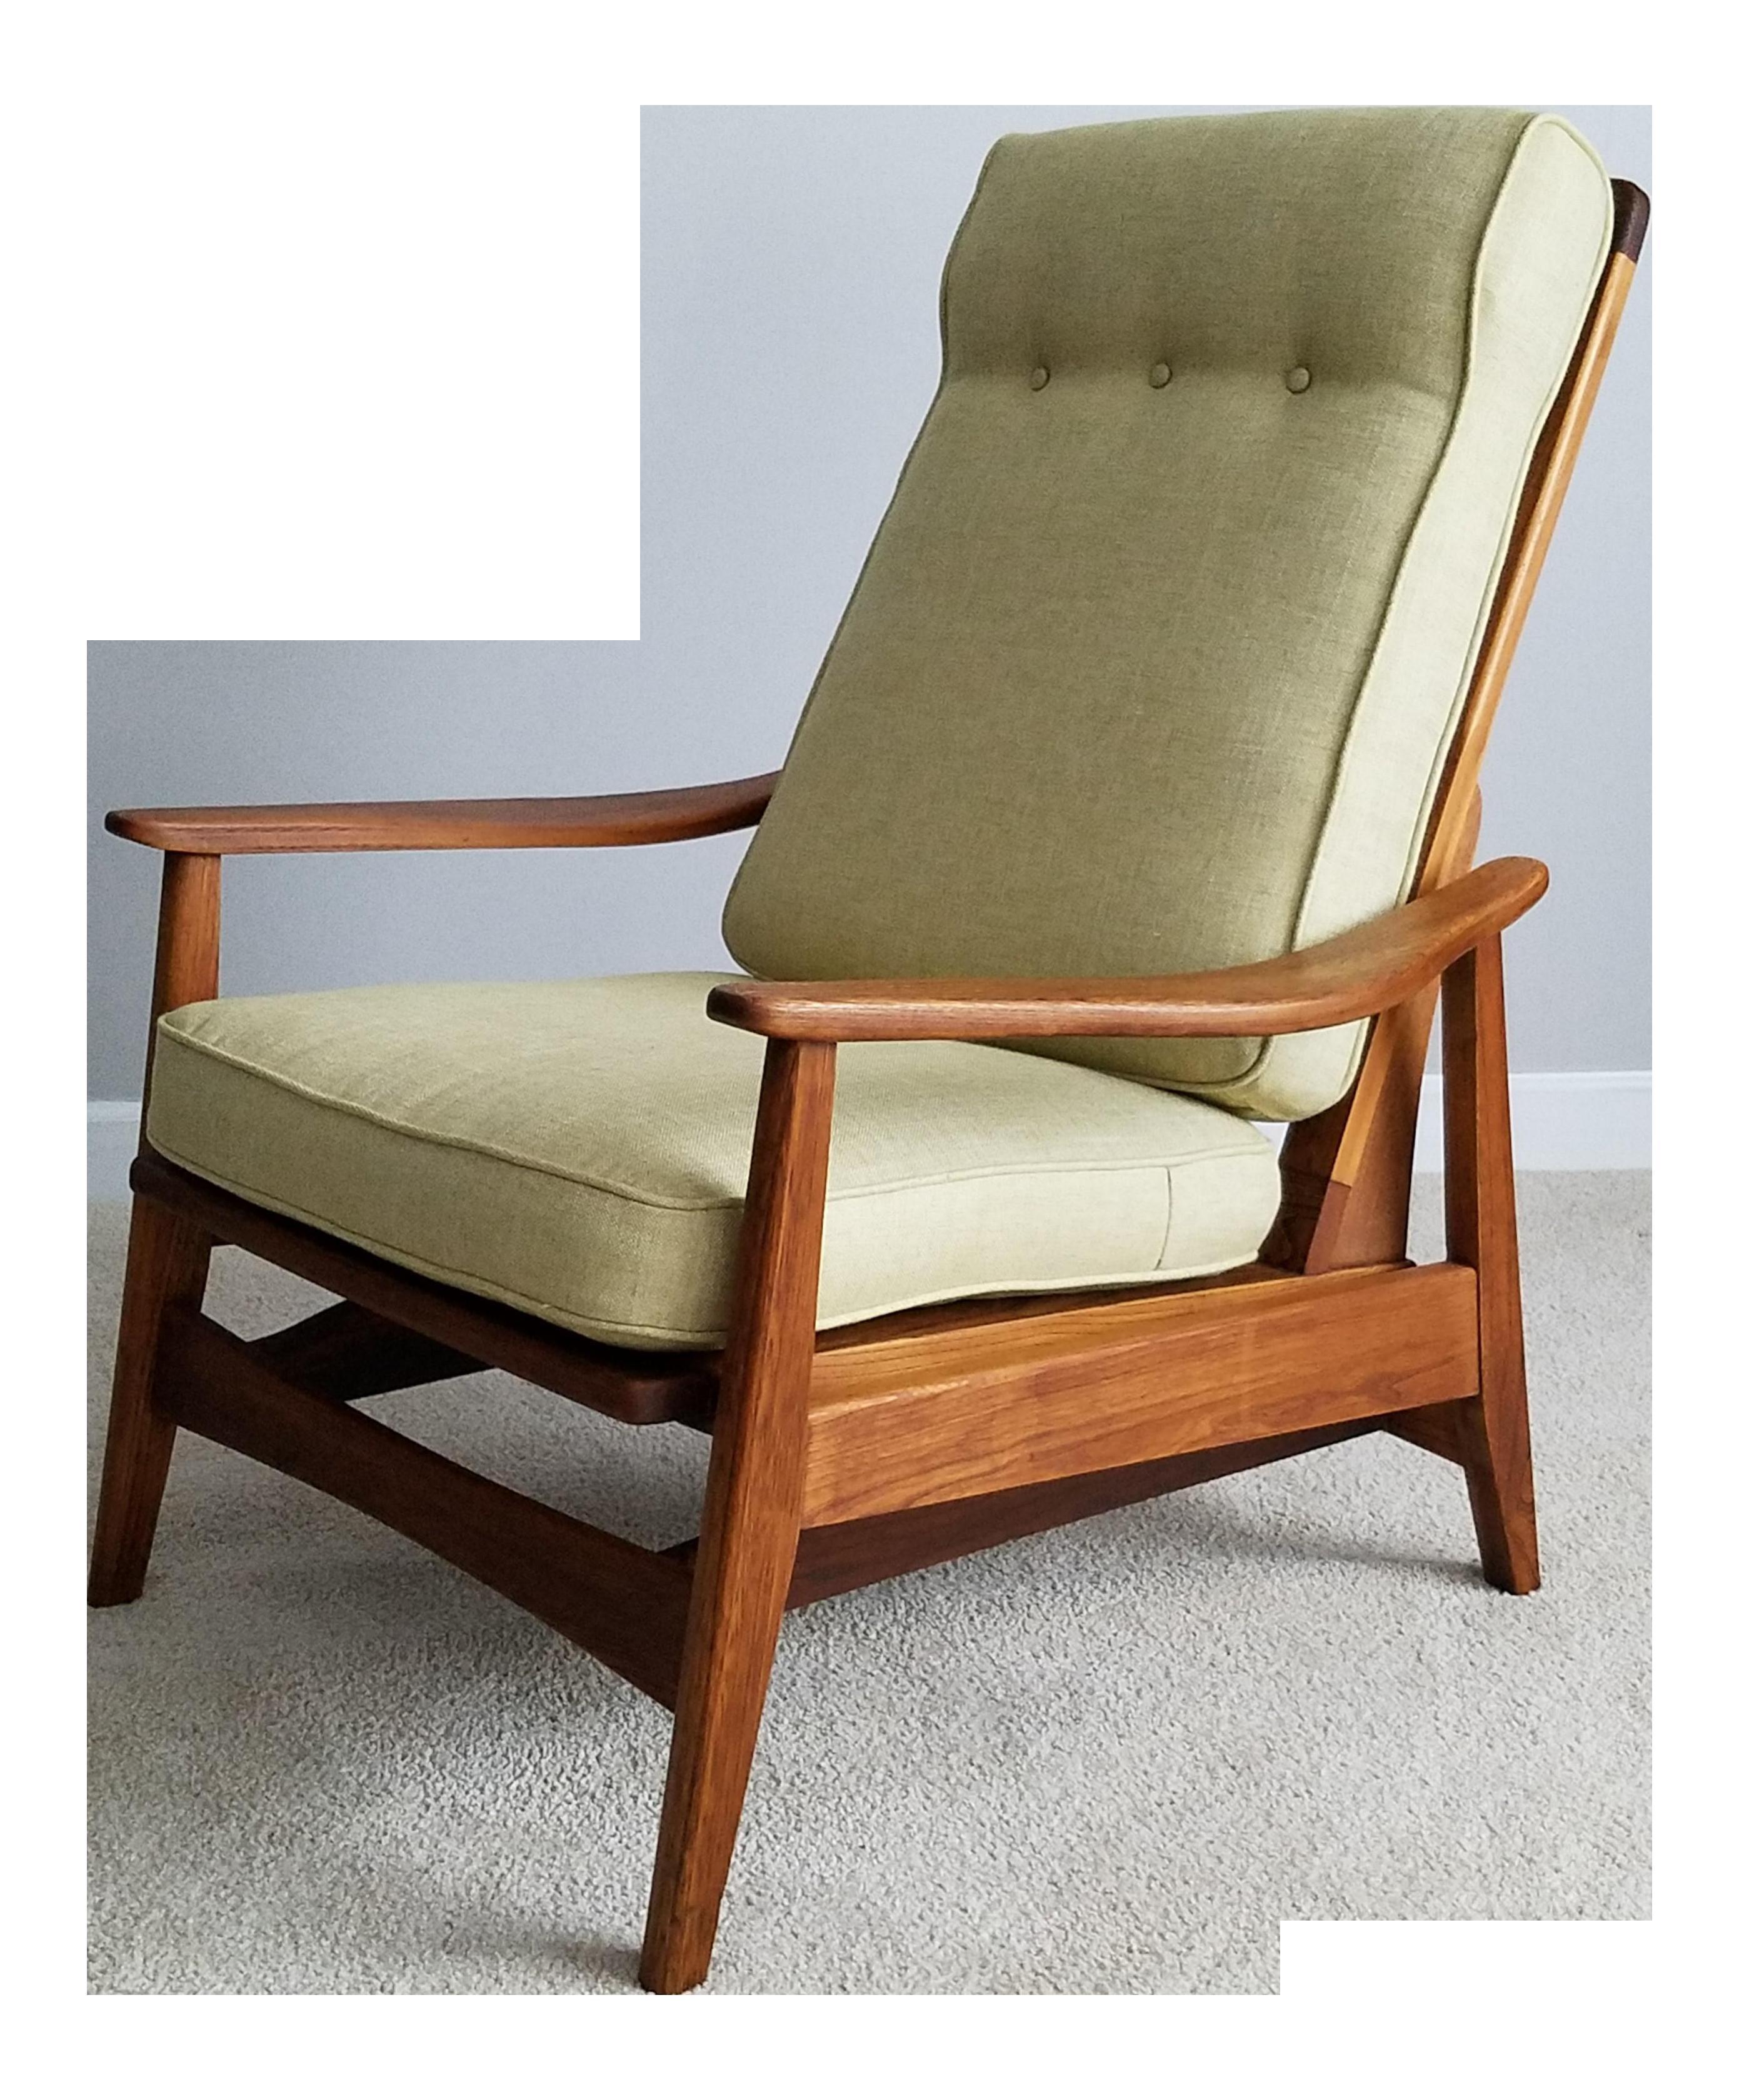 Danish Modern Mid Century Platform Rocker Lounge Chair